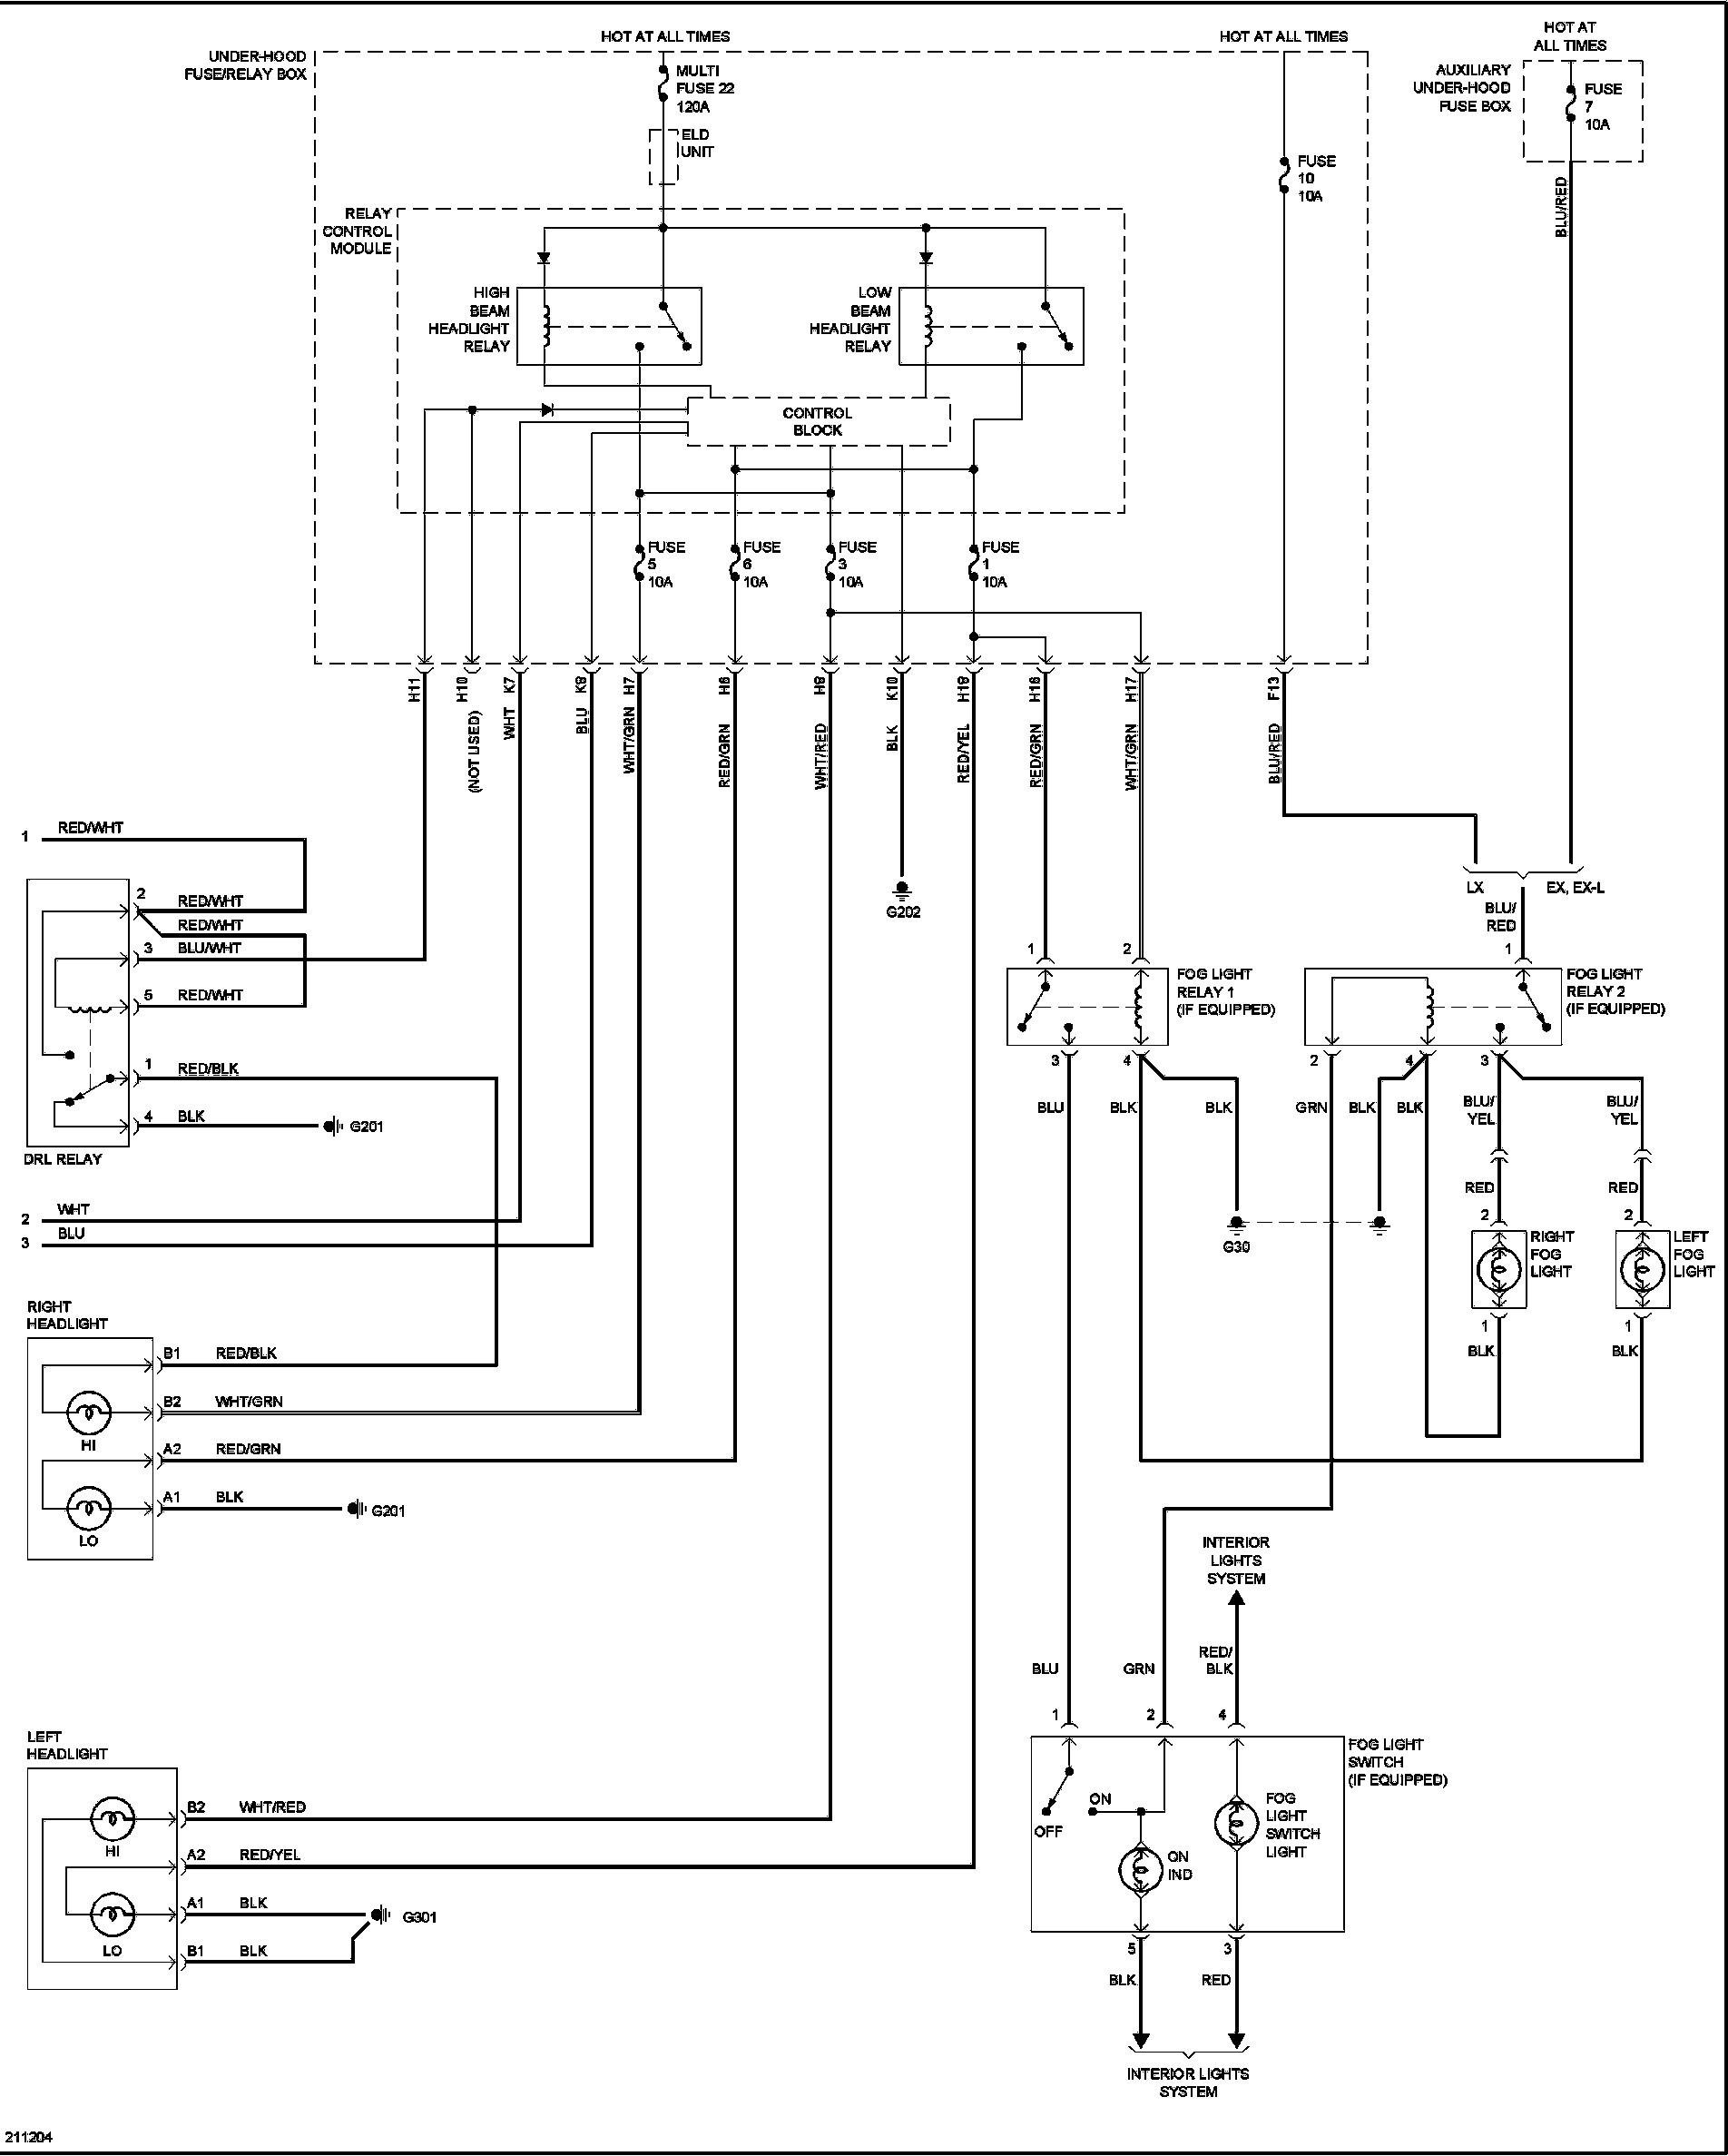 Wiring Diagram Honda Odyssey | Wiring Diagram on